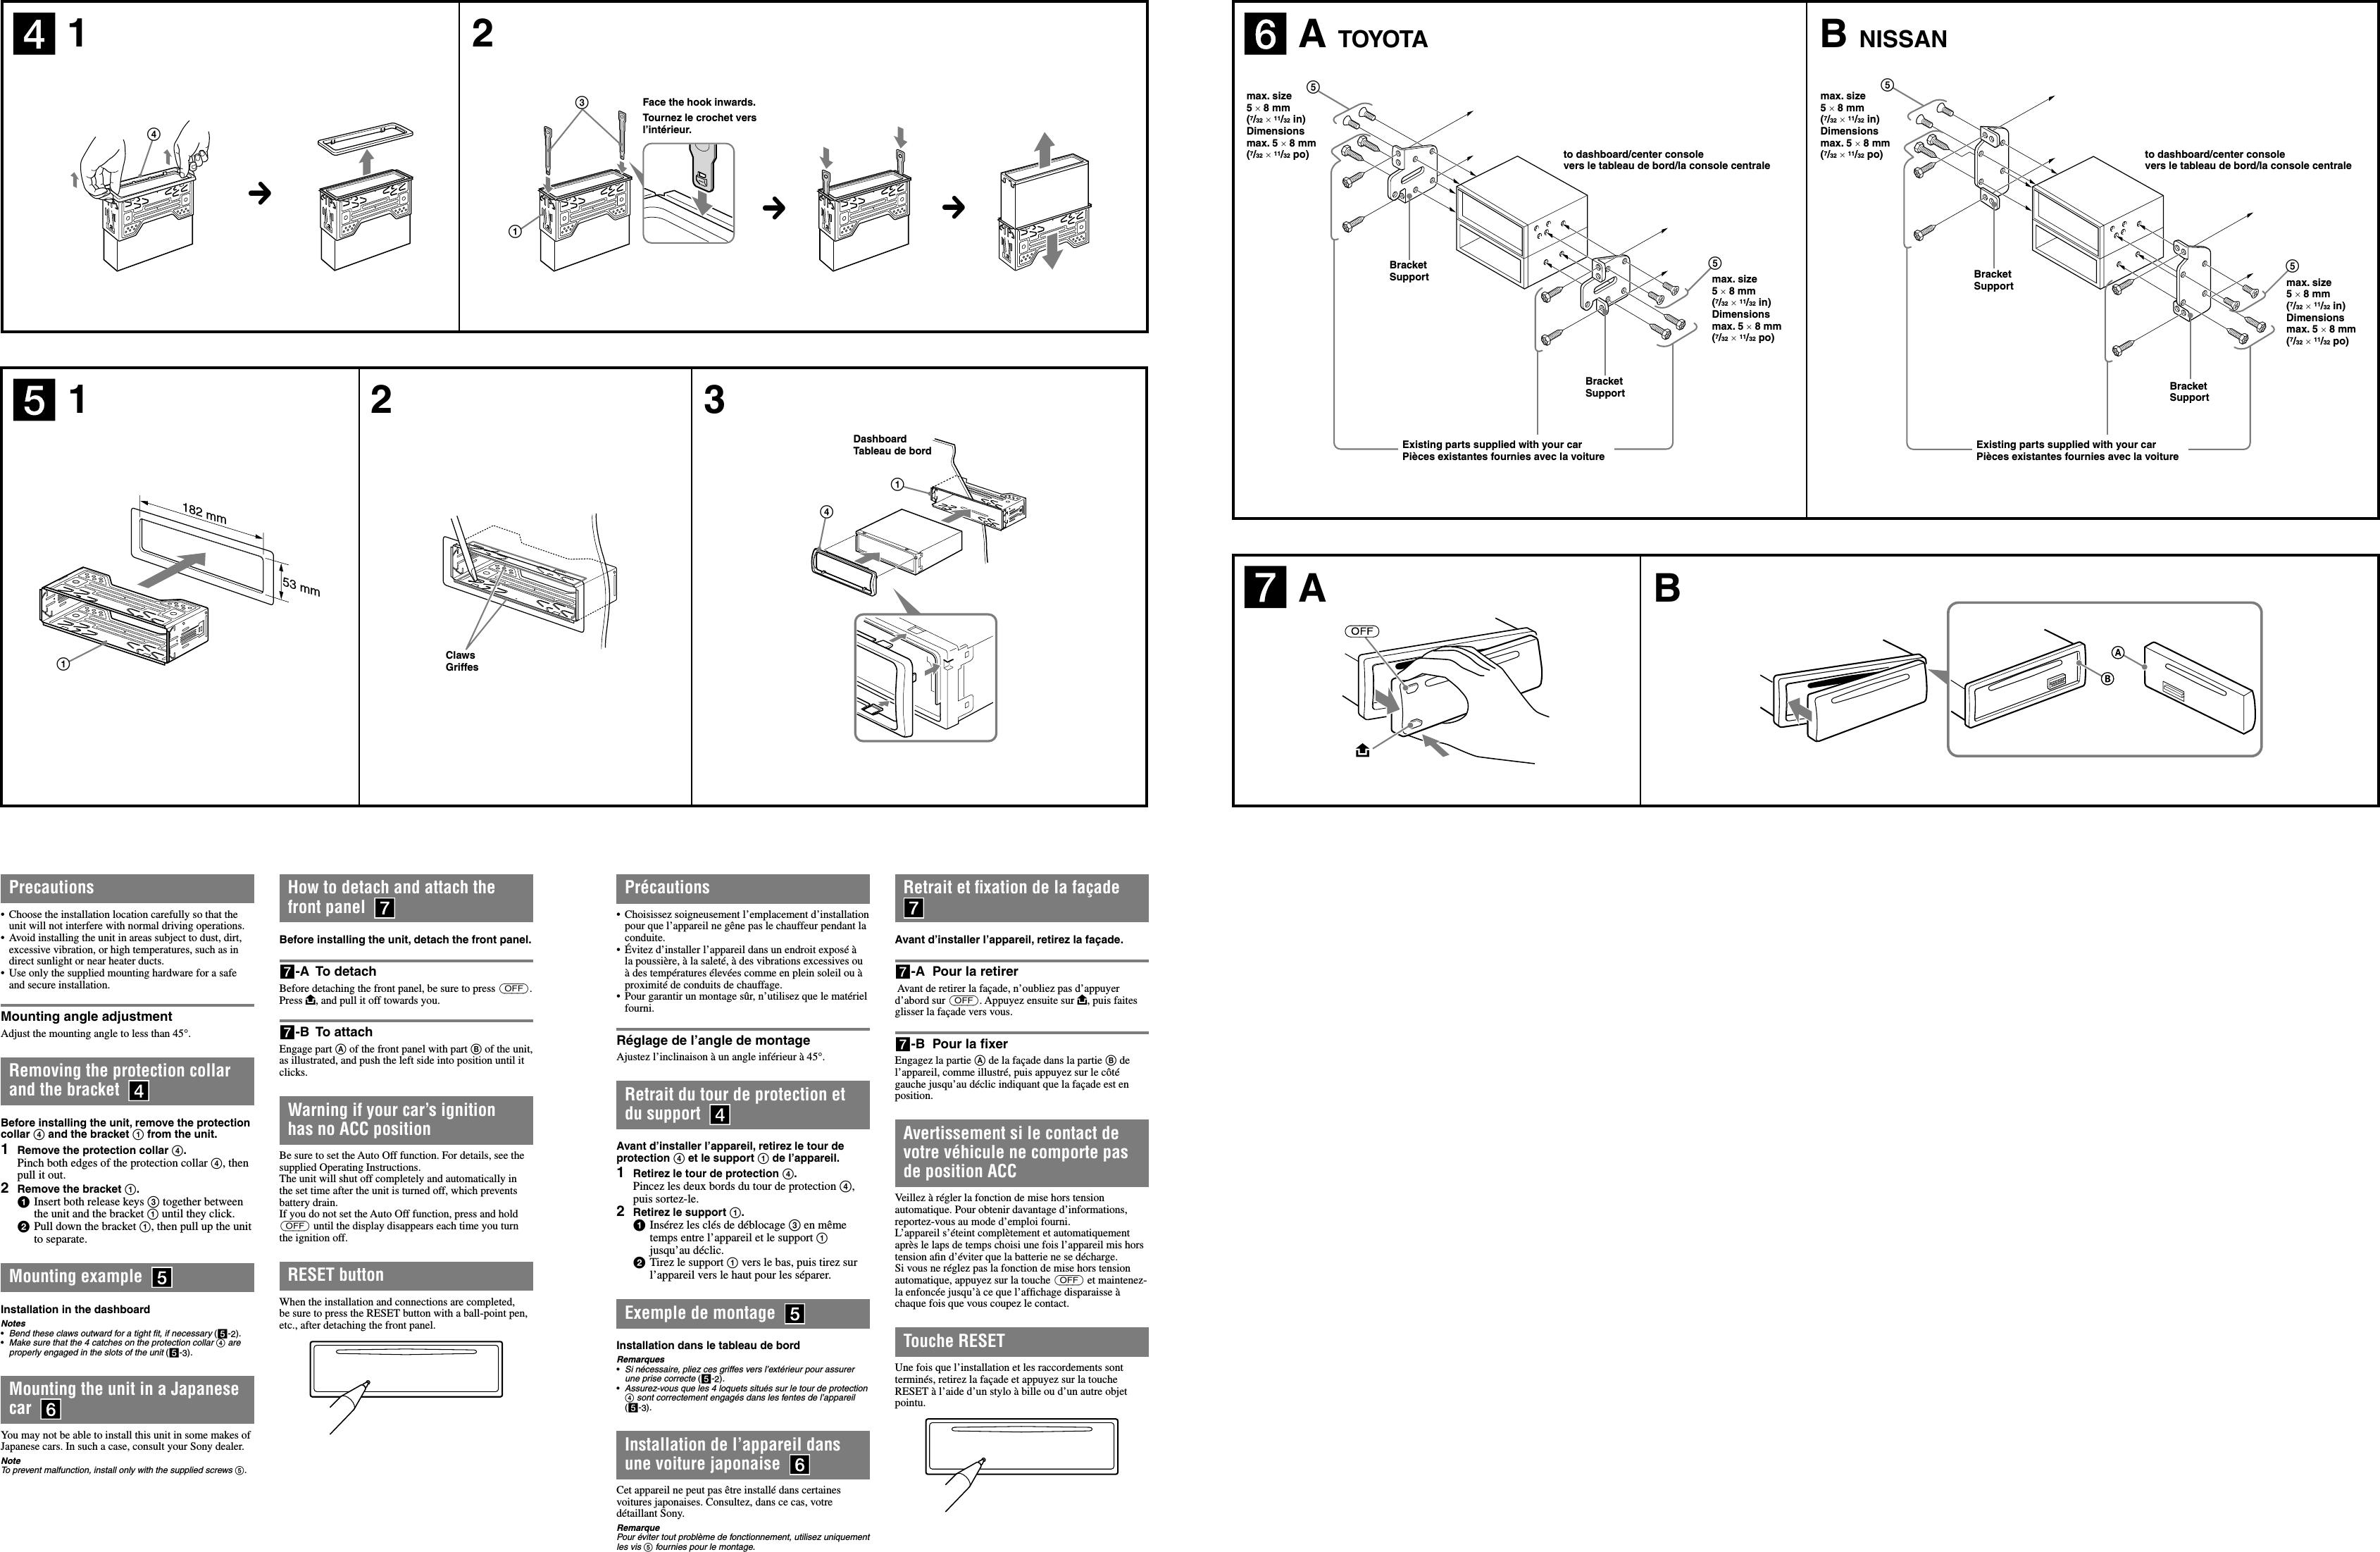 Sony Mex Bt2700 Wiring Diagram - Wiring Diagram Liry Radio Wiring Diagram For A Sony Mex Bt P on